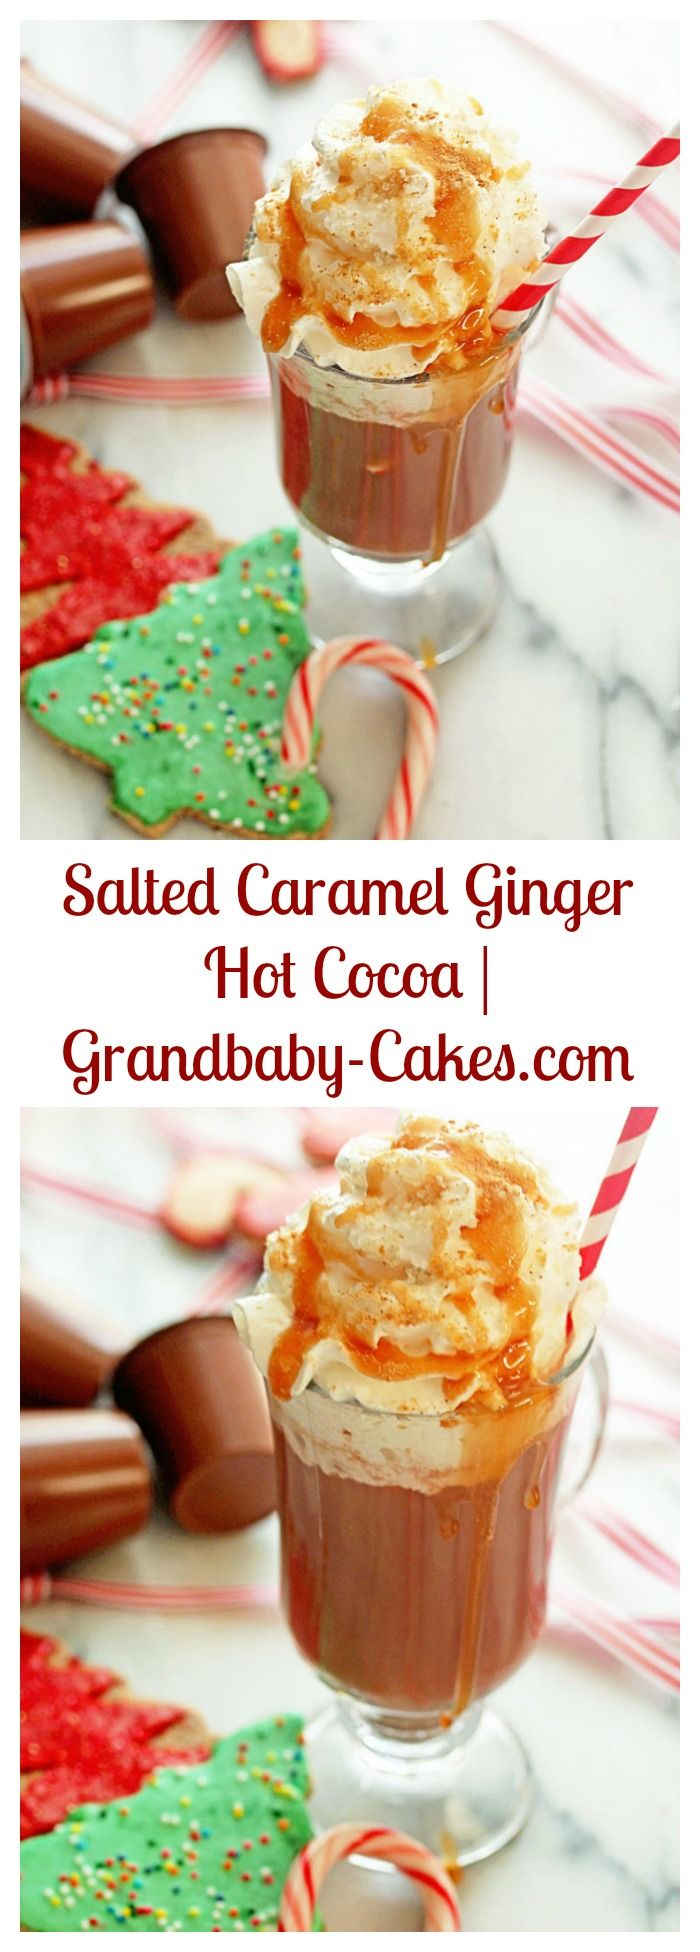 Salted Caramel Ginger Hot Cocoa | Grandbaby-Cakes.com